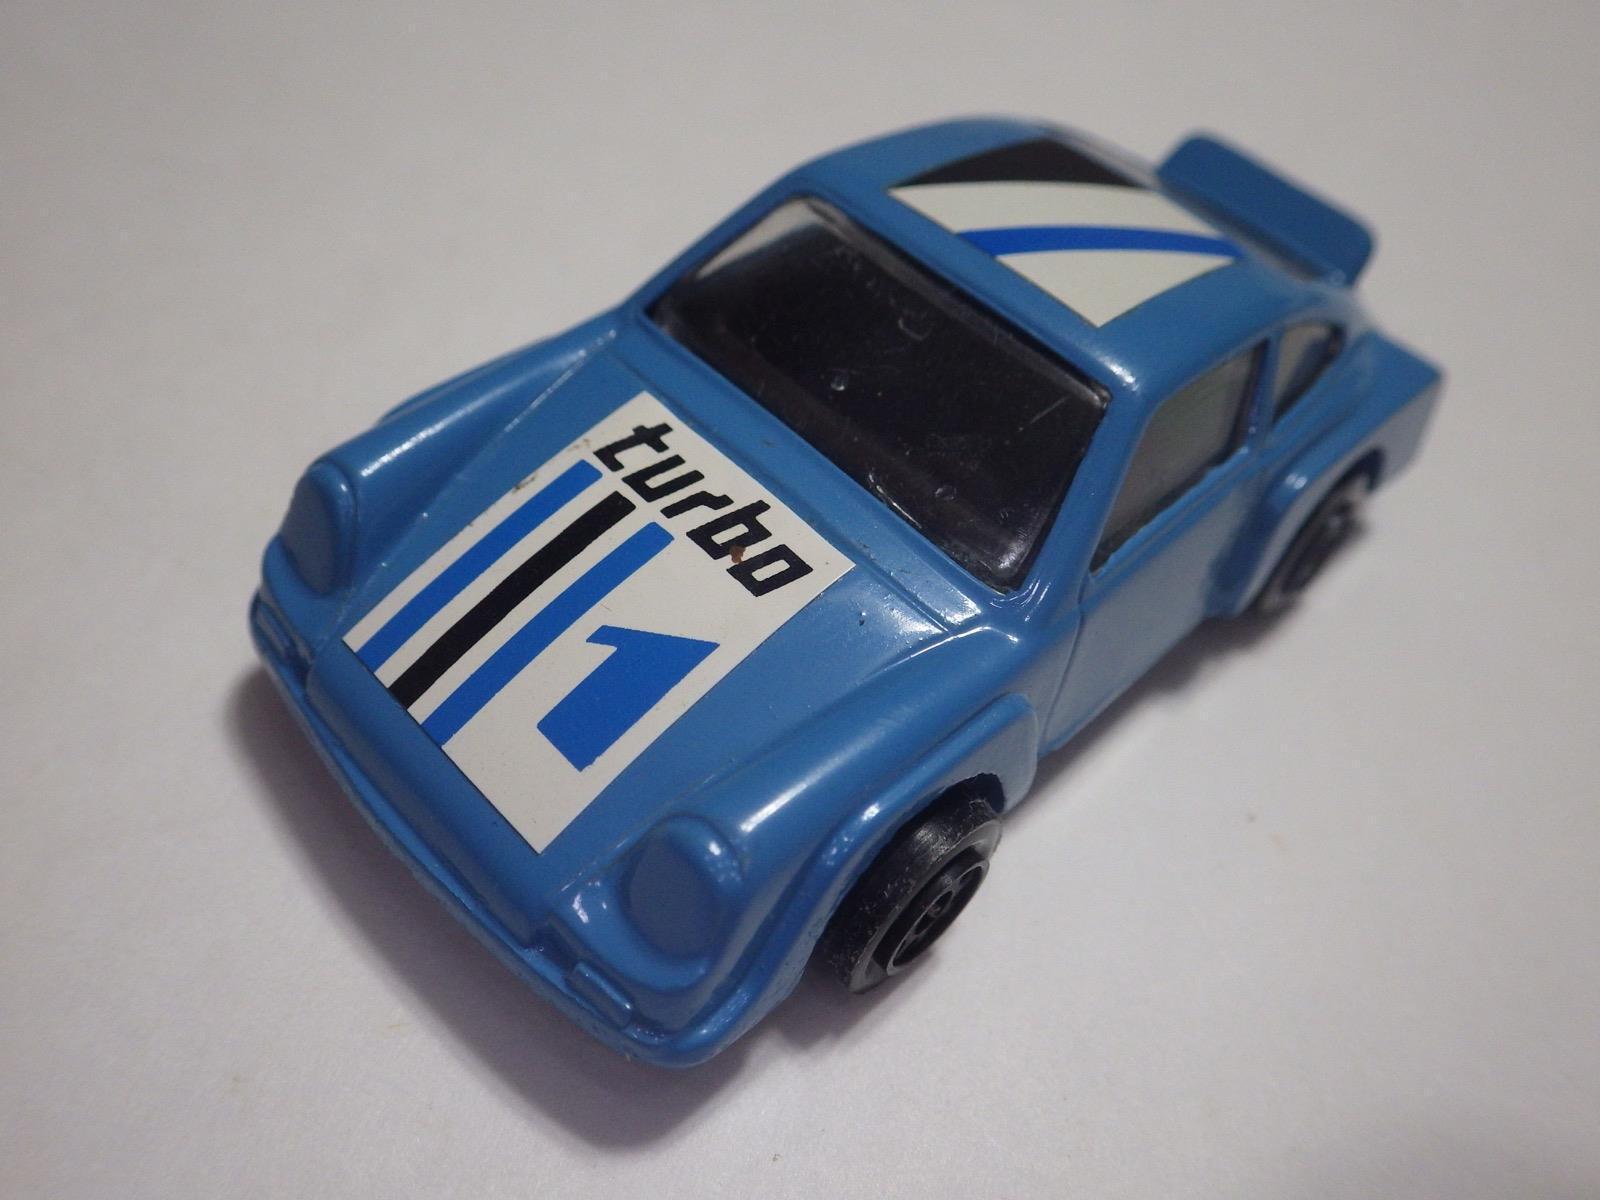 Carex (Poland) bluee Porsche Carrera Carrera Carrera RS (Turbo) Diecast 68-mm ec75e1